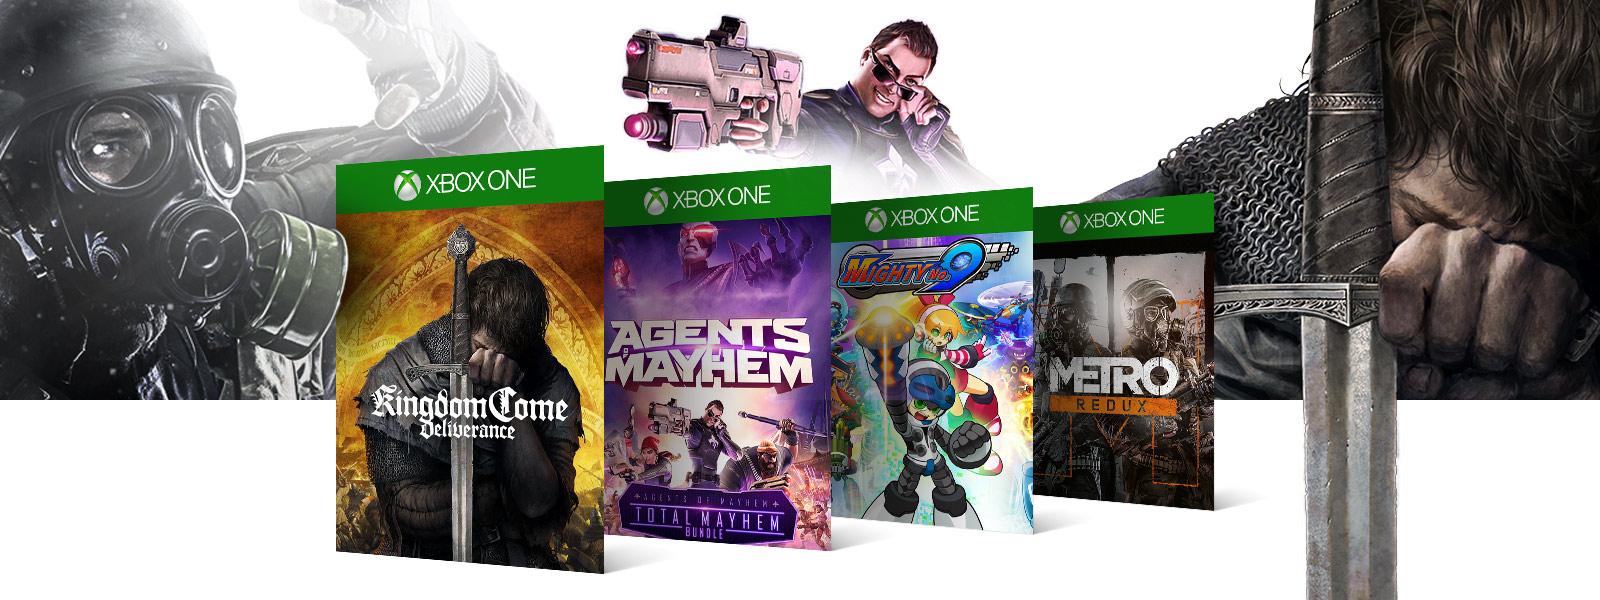 Kingdom Come Deliverance Agents Mayhem Mighty No 9 Metro Redux boxshots